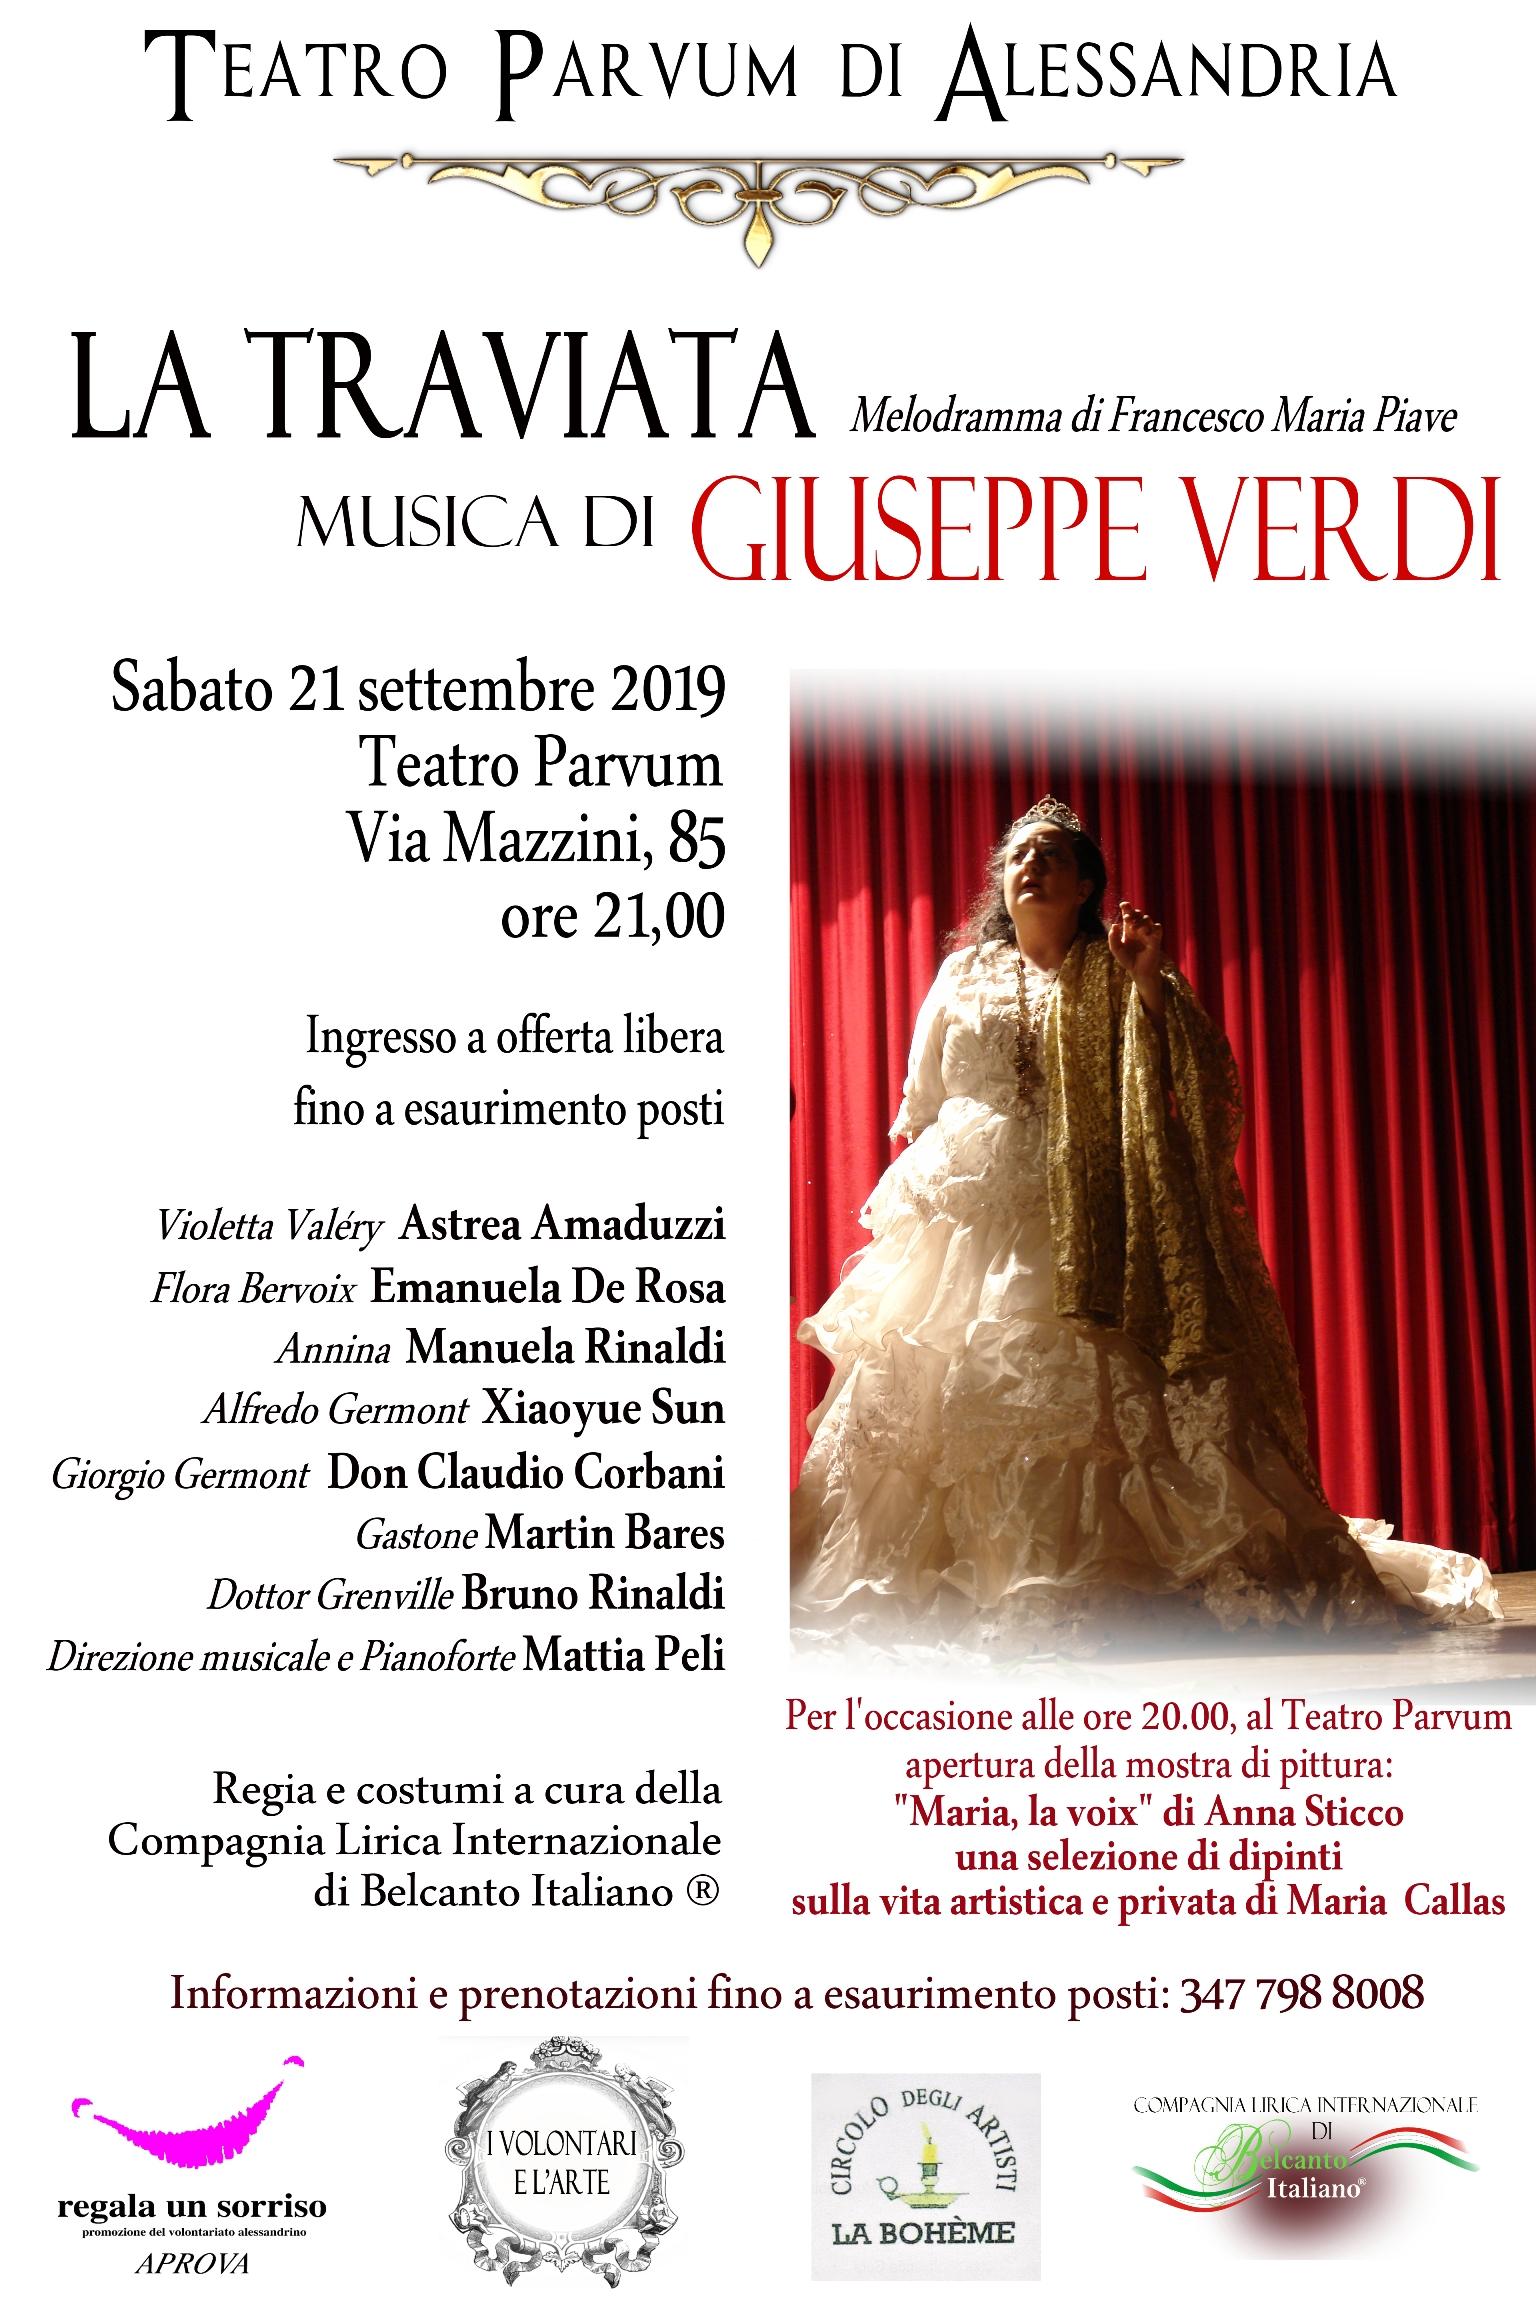 Locandina Traviata ALESSANDRIA sett 2019 R.jpg